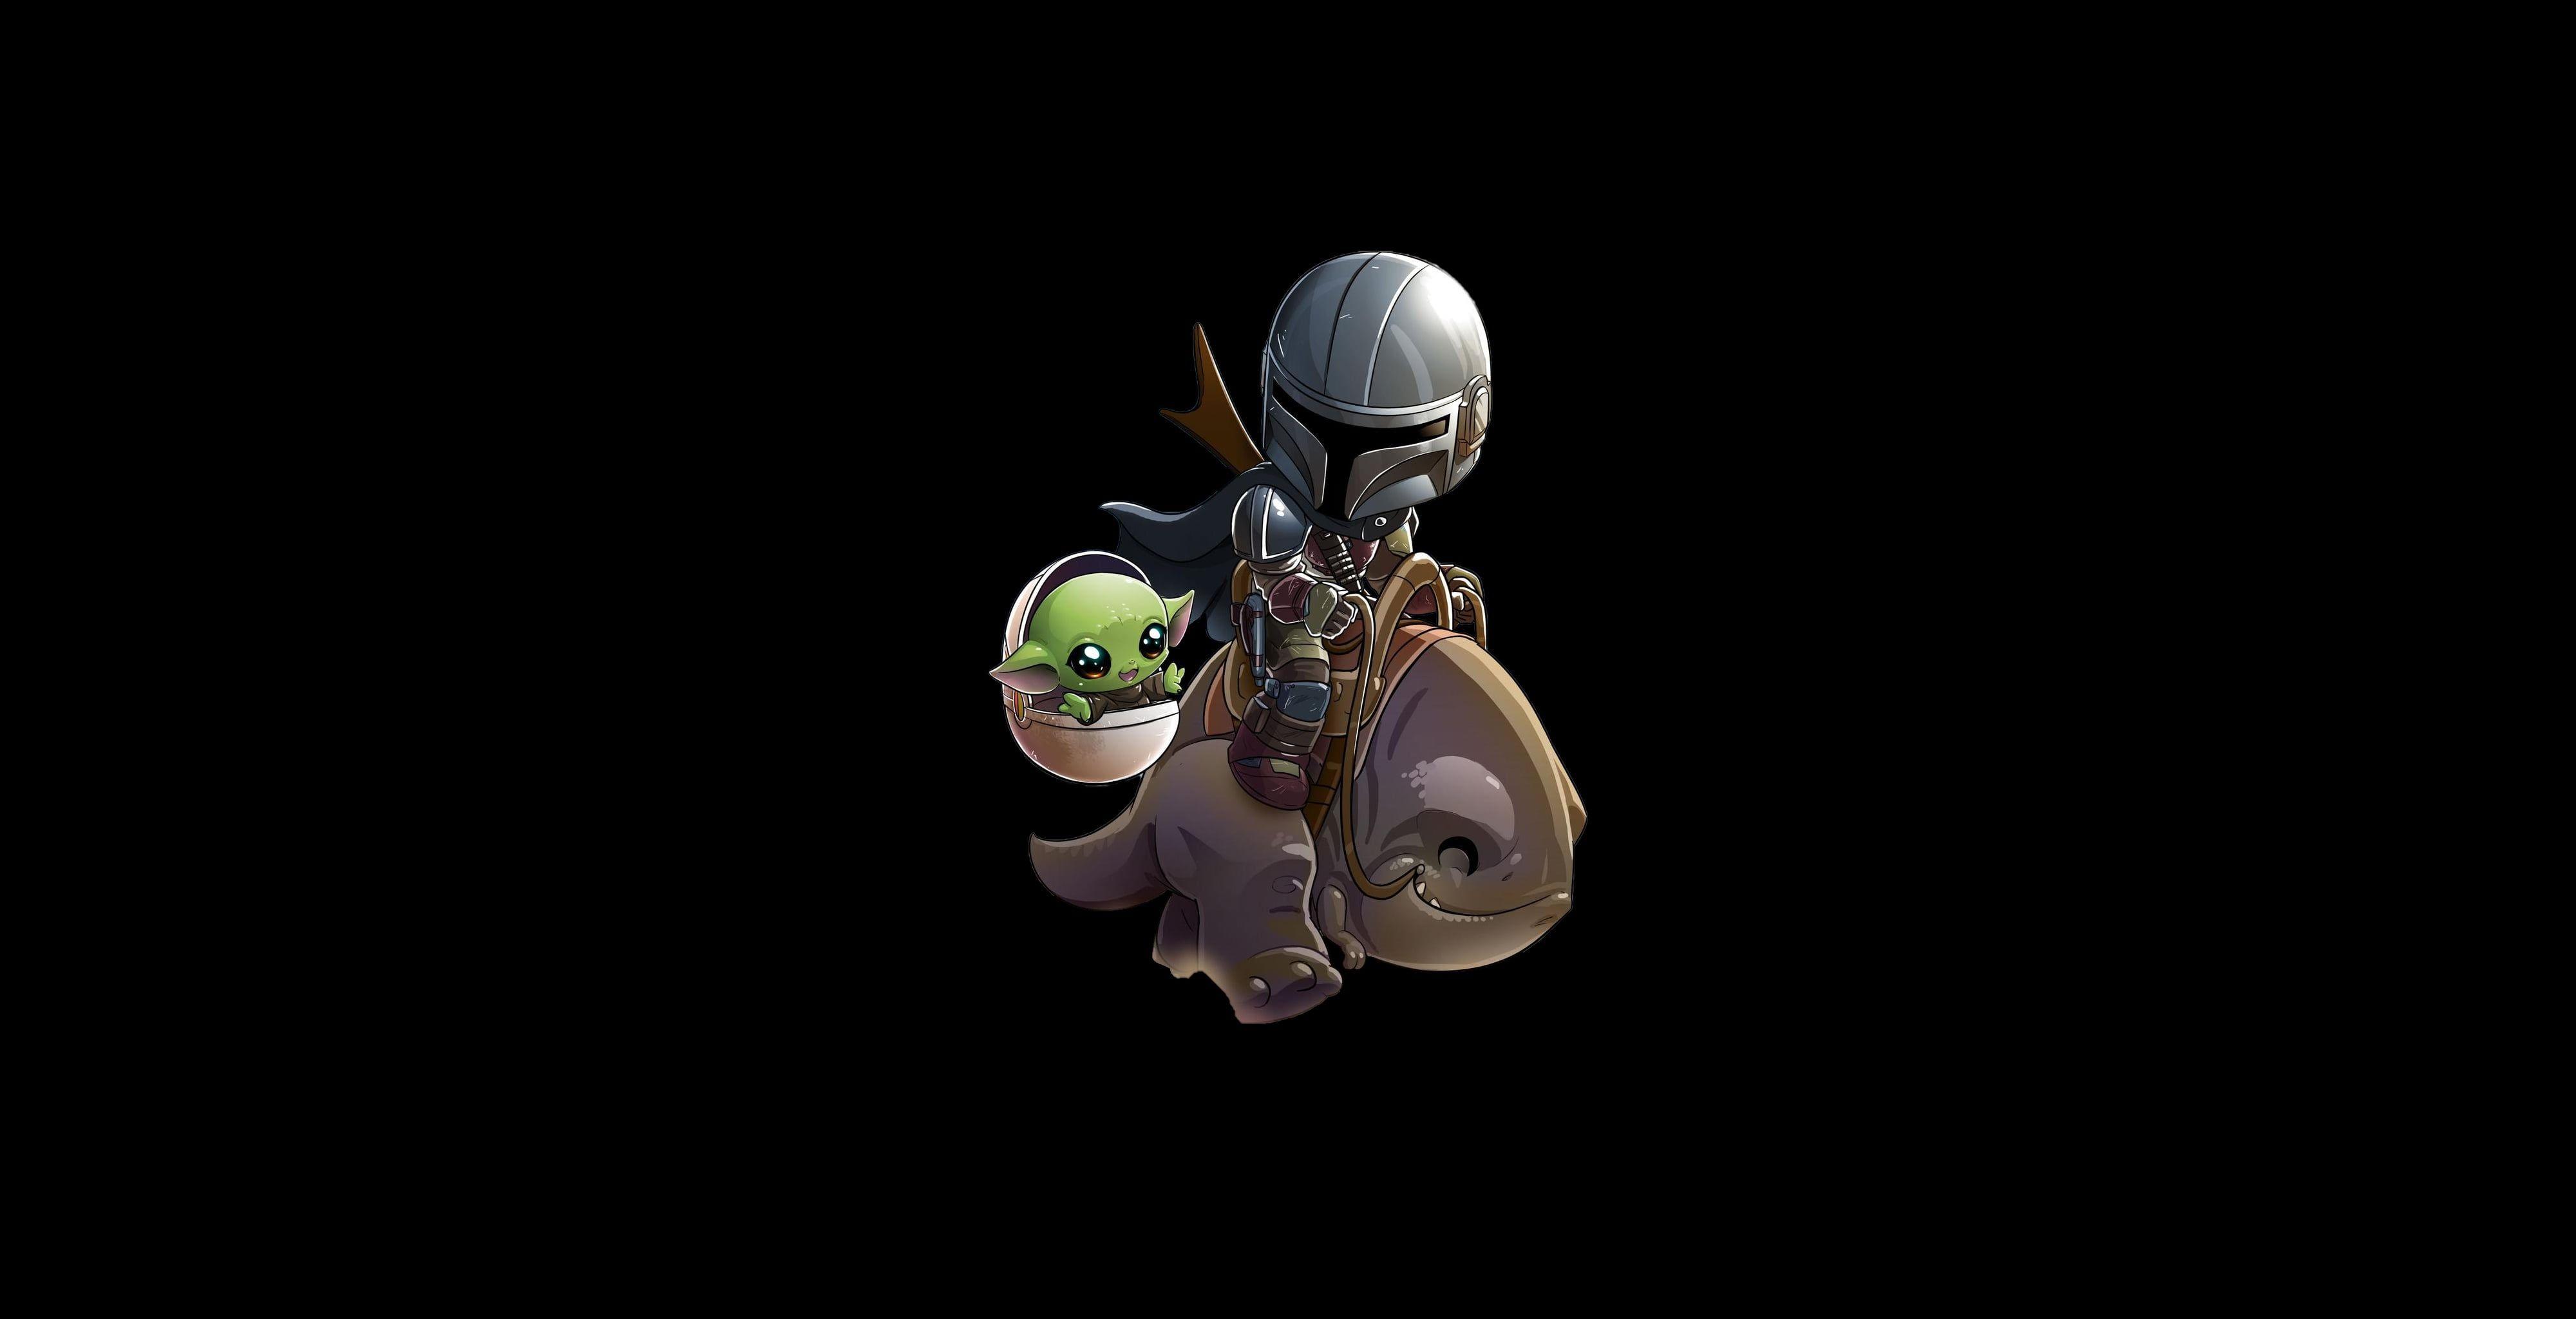 Minimalism Star Wars Baby Yoda The Mandalorian 4k Wallpaper Hdwallpaper Desktop In 2020 Hd Wallpaper Yoda Star Wars Images